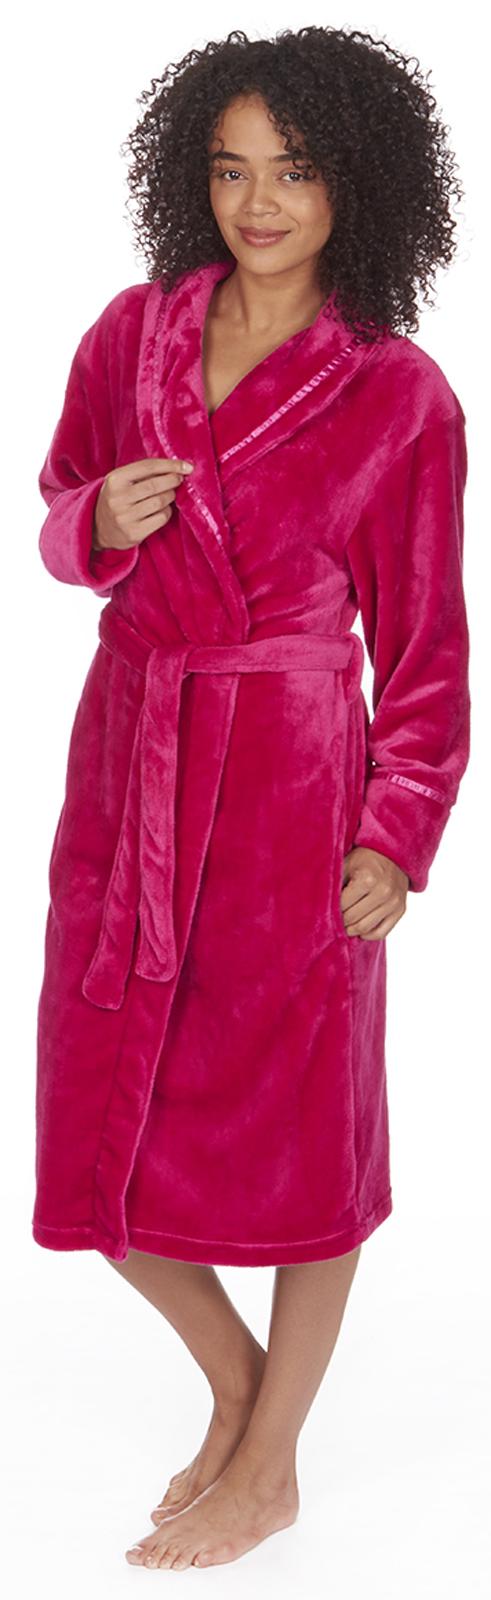 Womens Full Length Luxury Flannel Fleece Dressing Gown Bath Robe ...